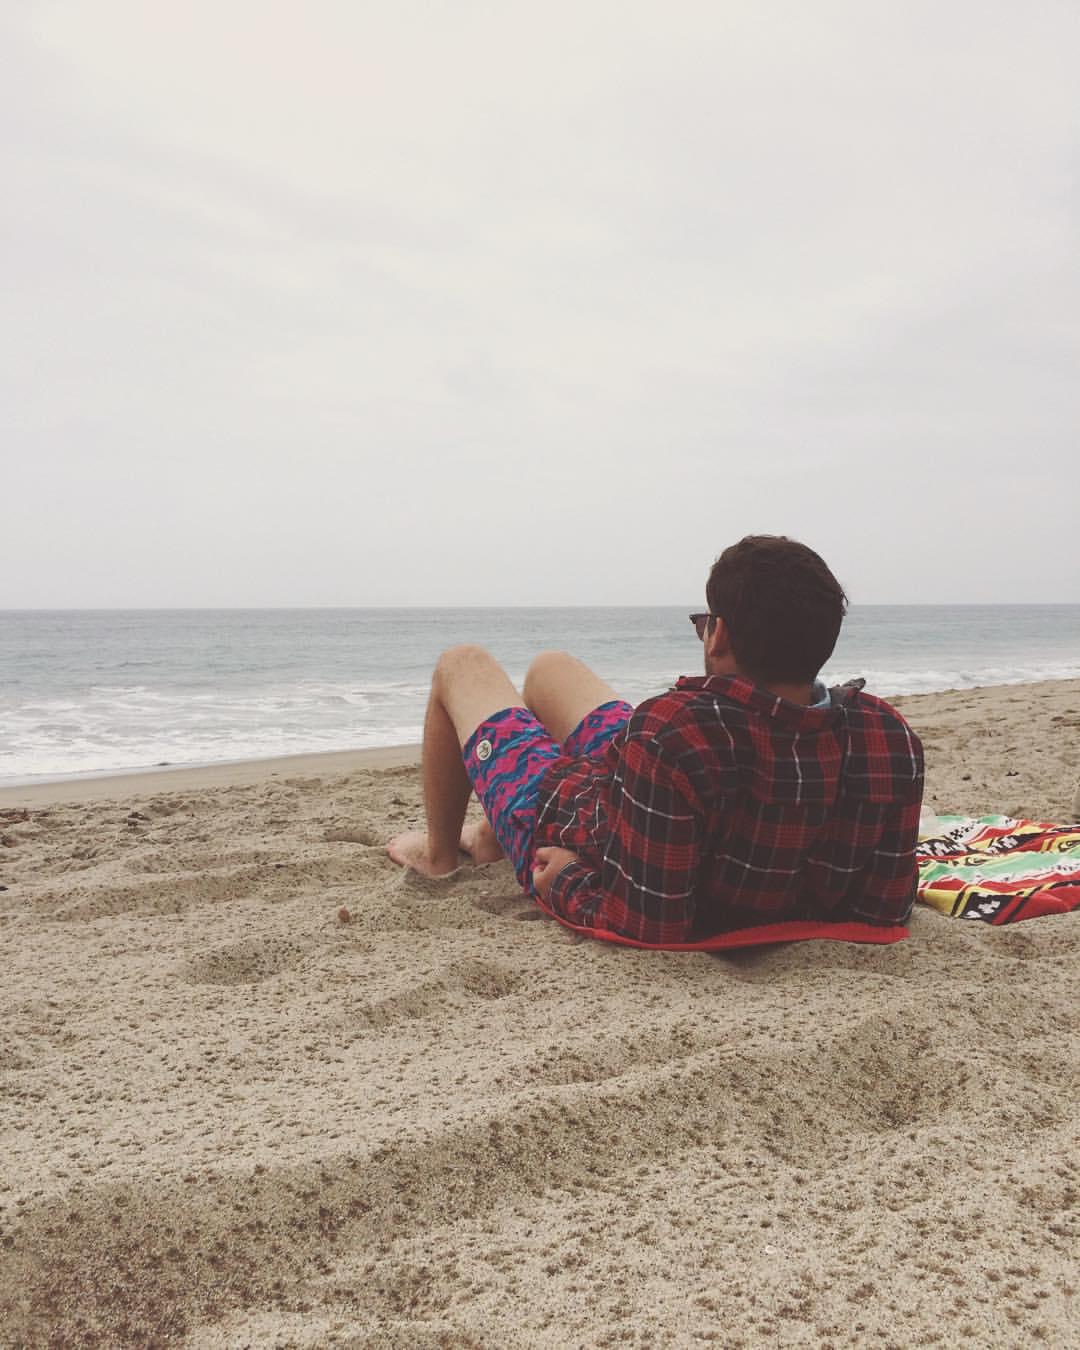 just-layingout-at-the-beach-intherain-malibu-why-you-hadta-be-all-rainy-on-me-last-week-zumabeach-pointdume-dontkickjimmy-238365_21134099742_o.jpg